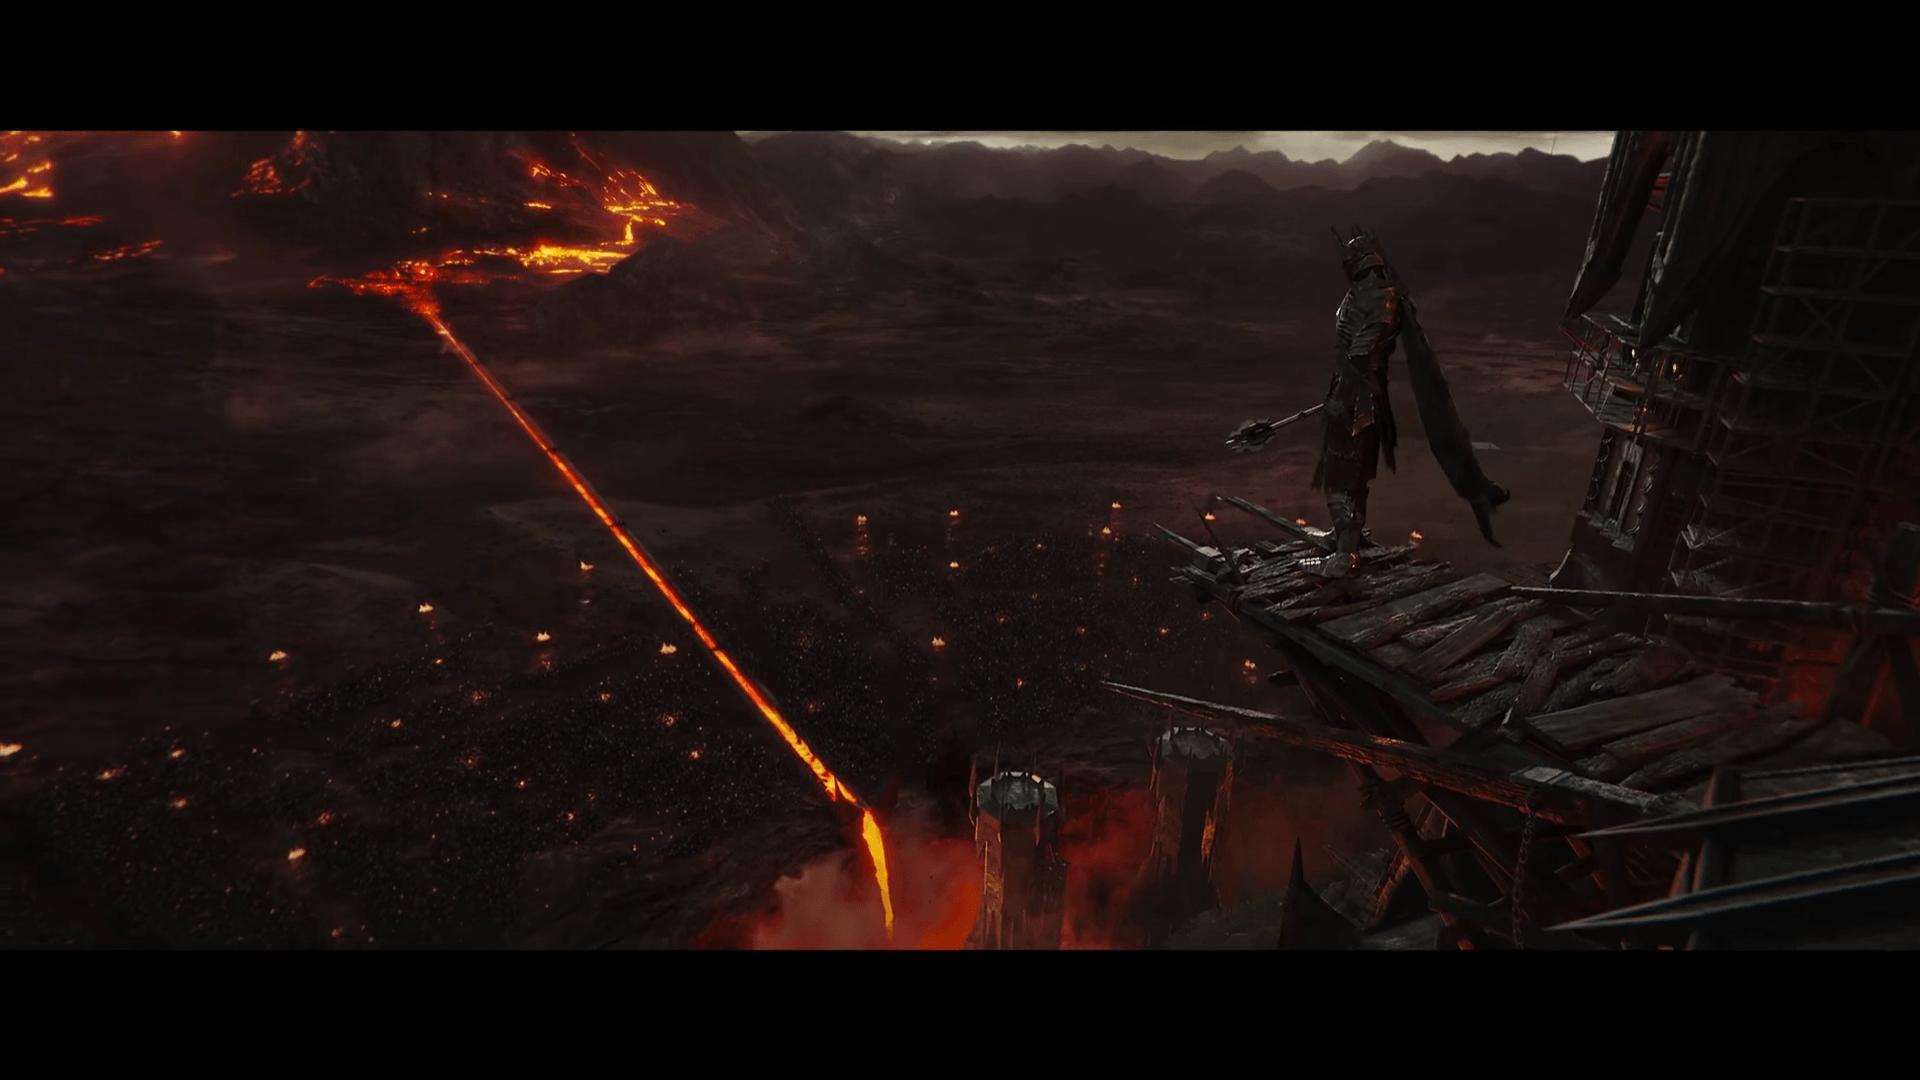 Sauron Wallpapers Wallpaper Cave